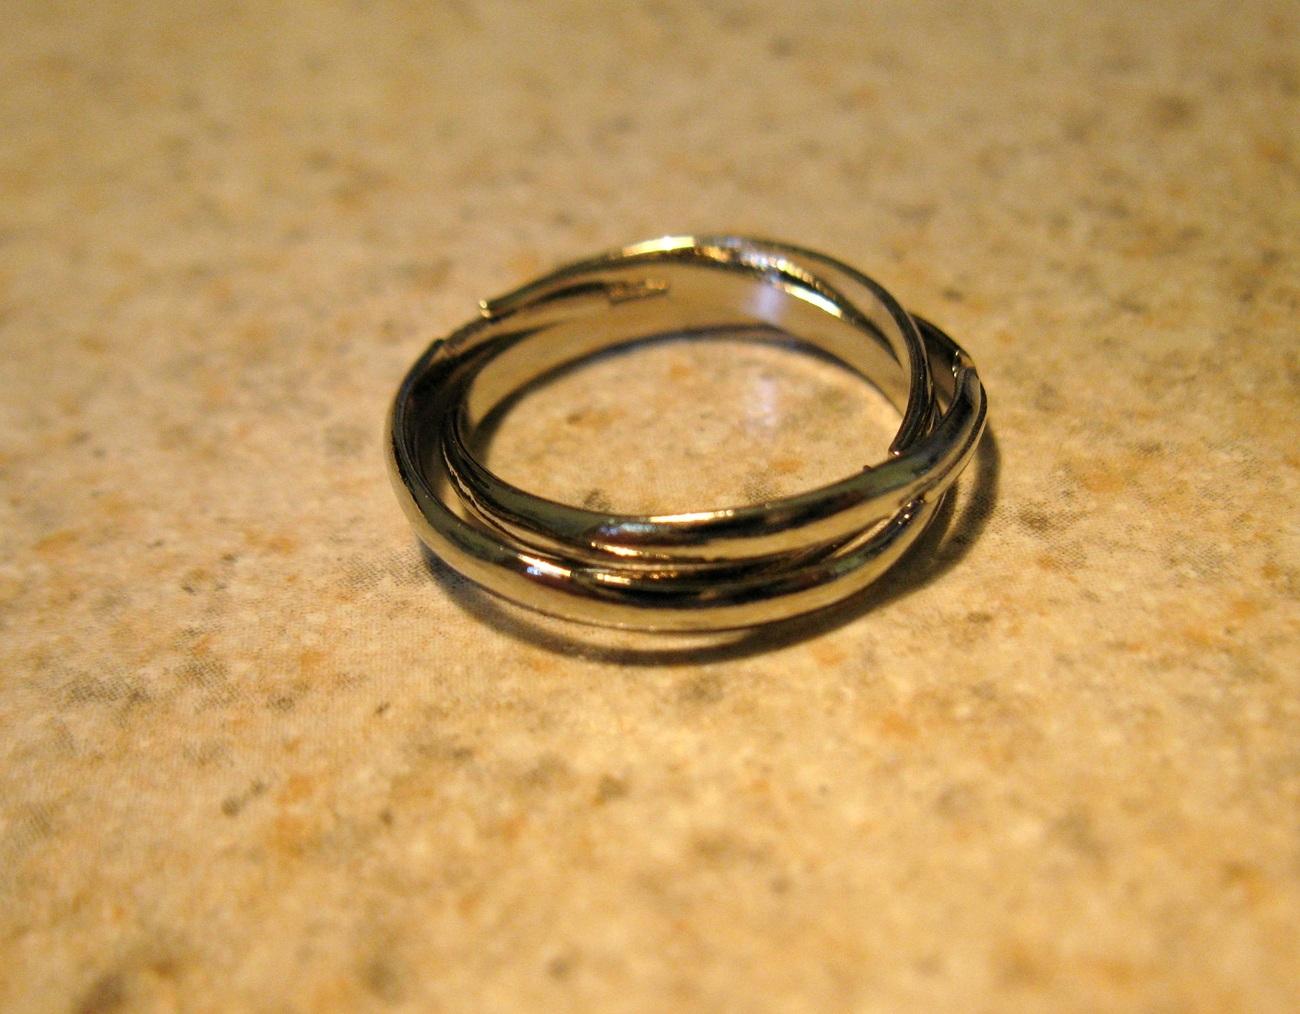 790 triple ring size 5.5